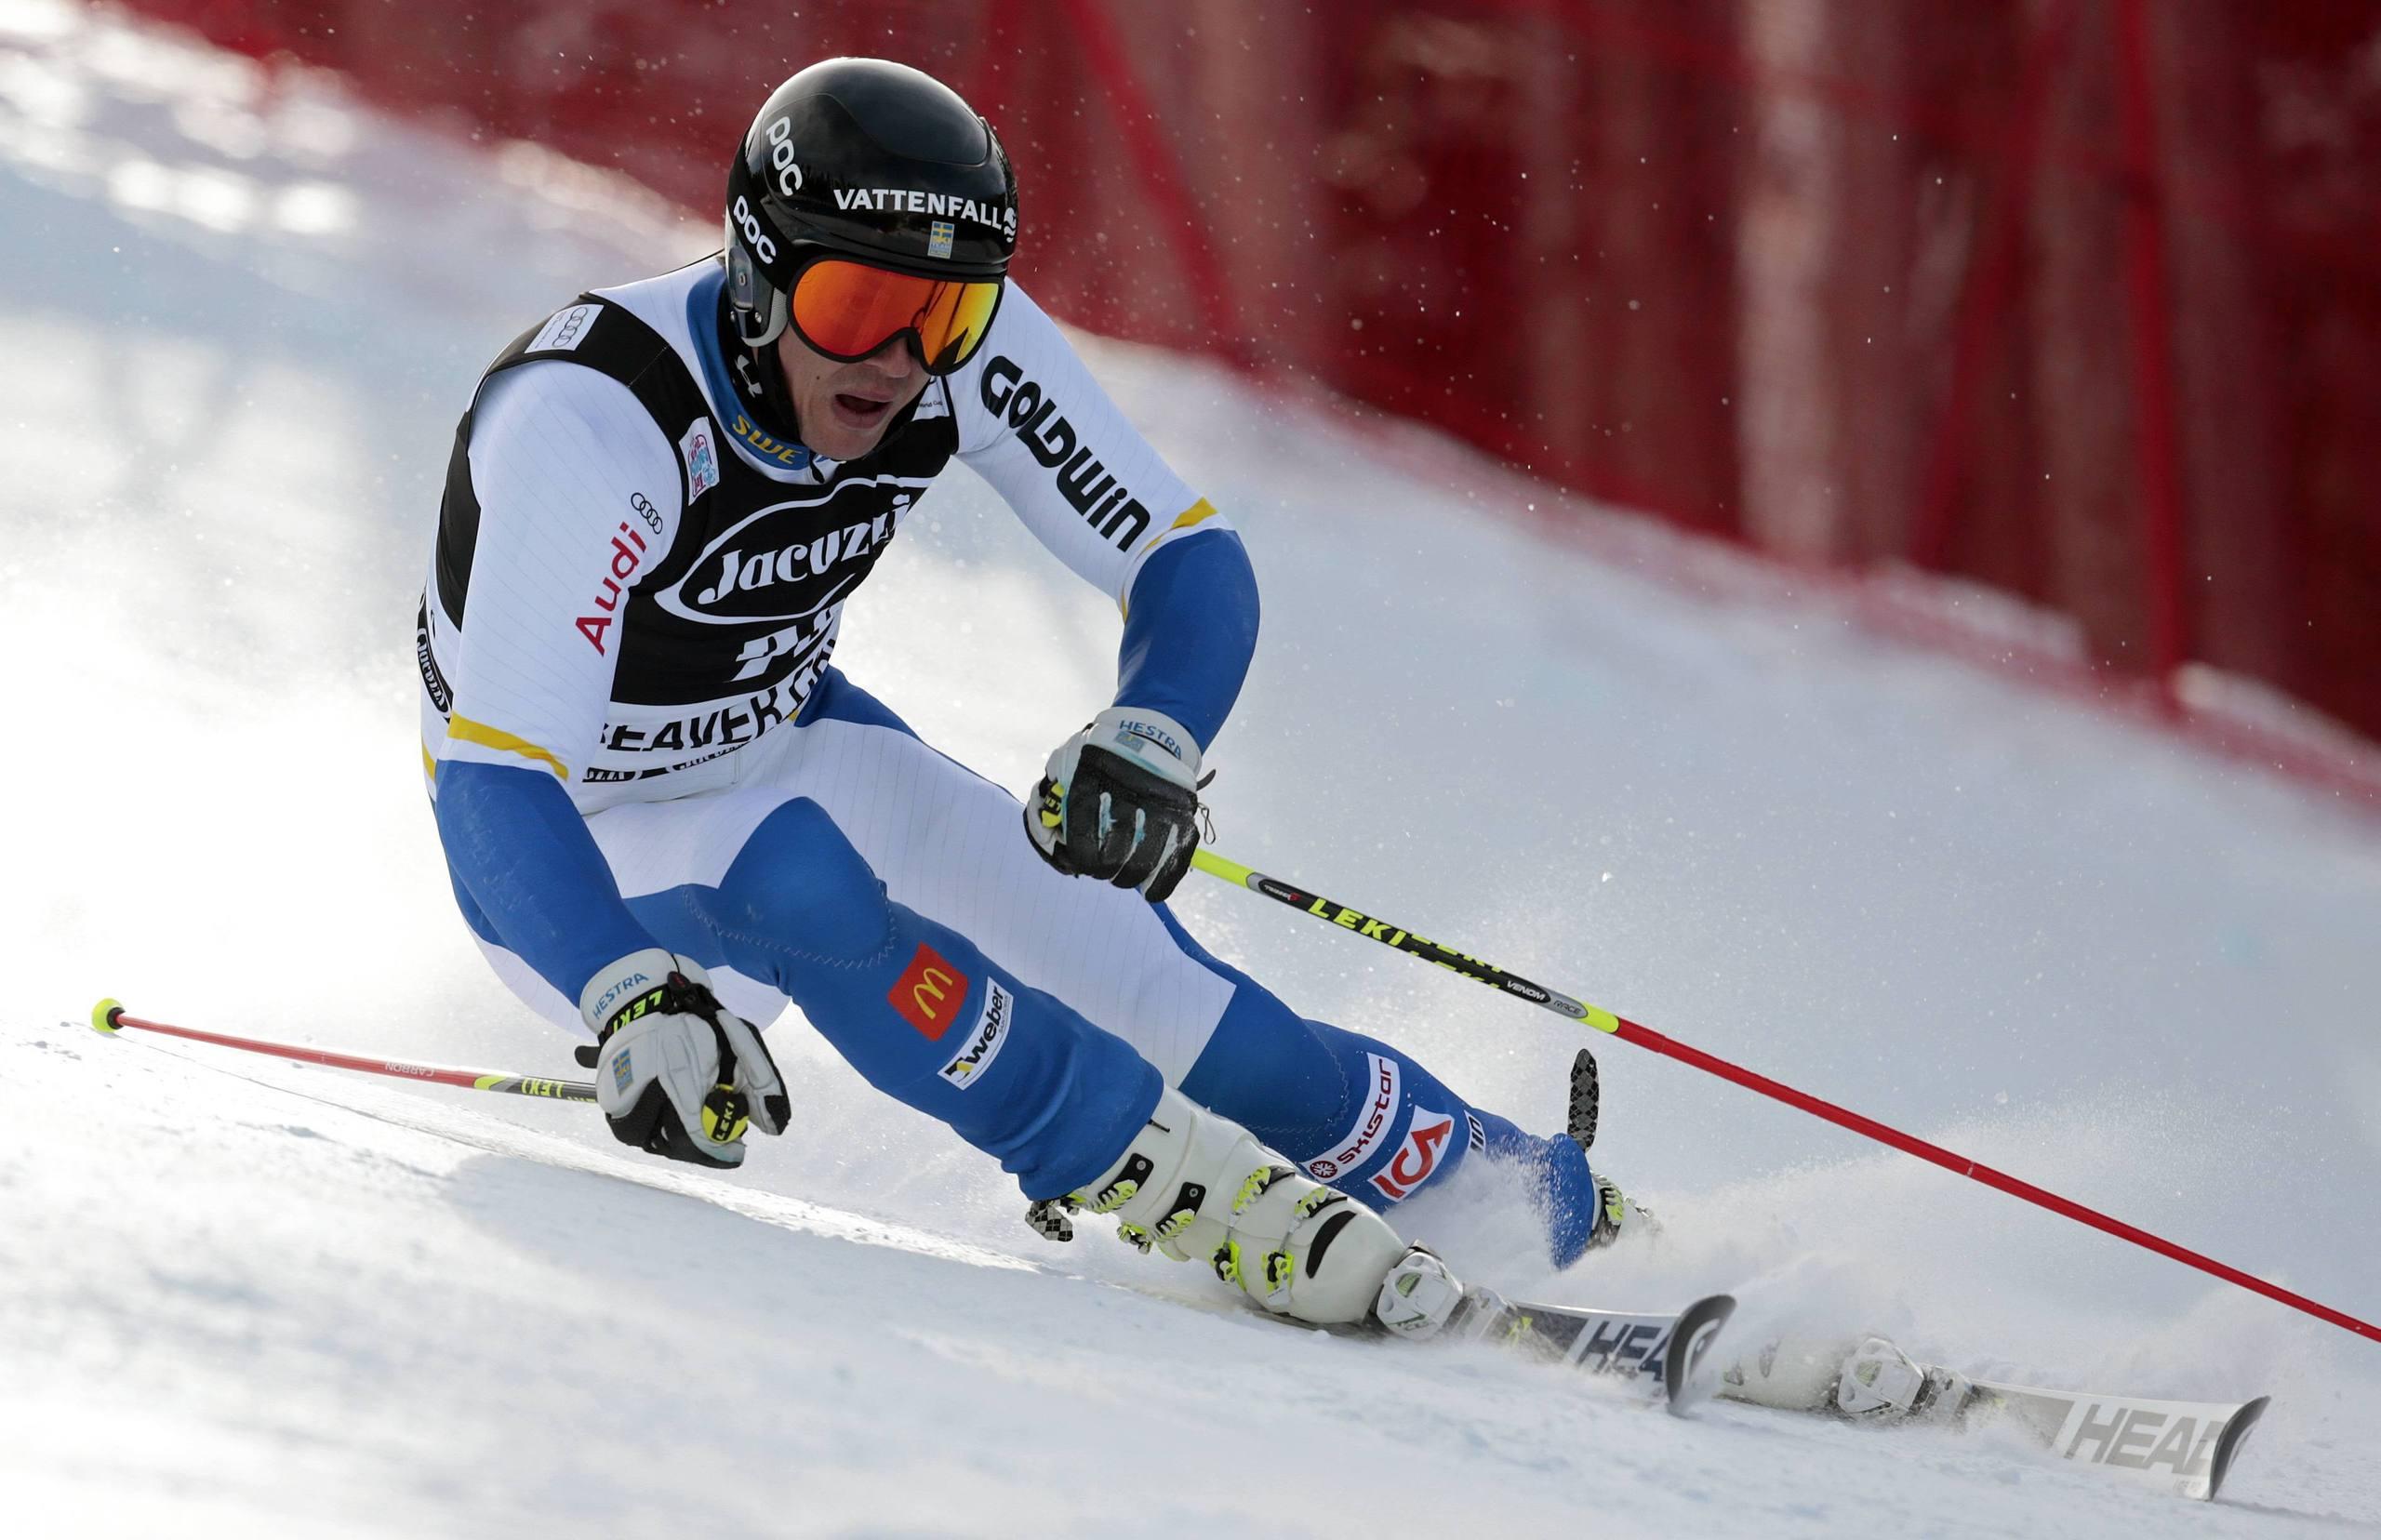 Markus larsson baste svensk i adelboden